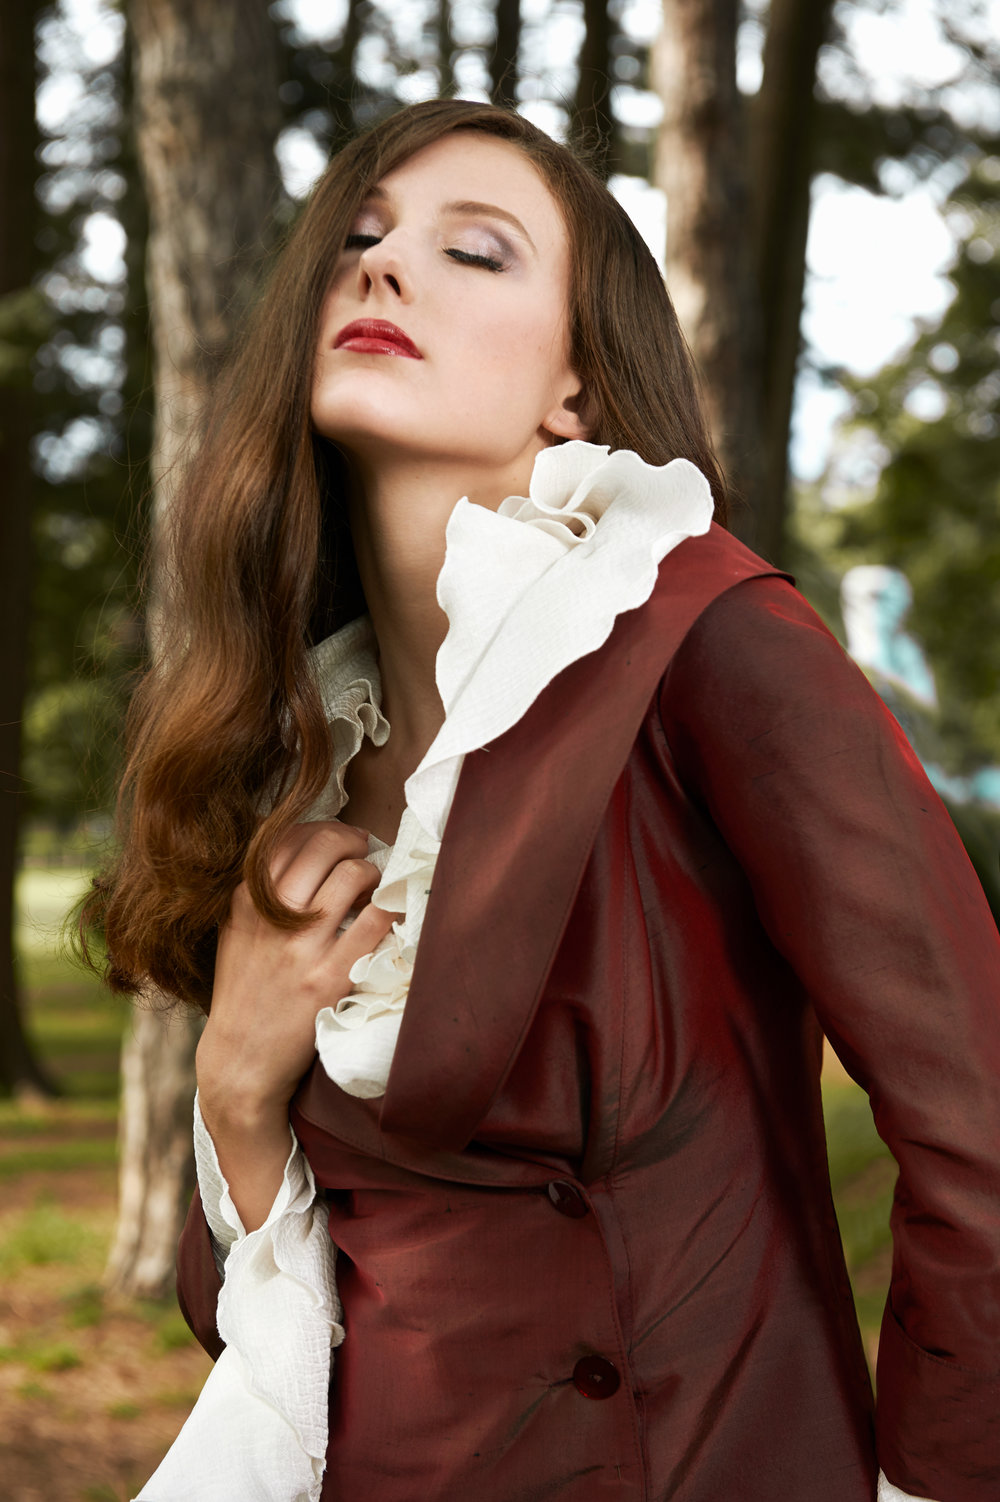 Marta-Hewson-Hamilton-Magazine-Fall-Designers-35173.jpg